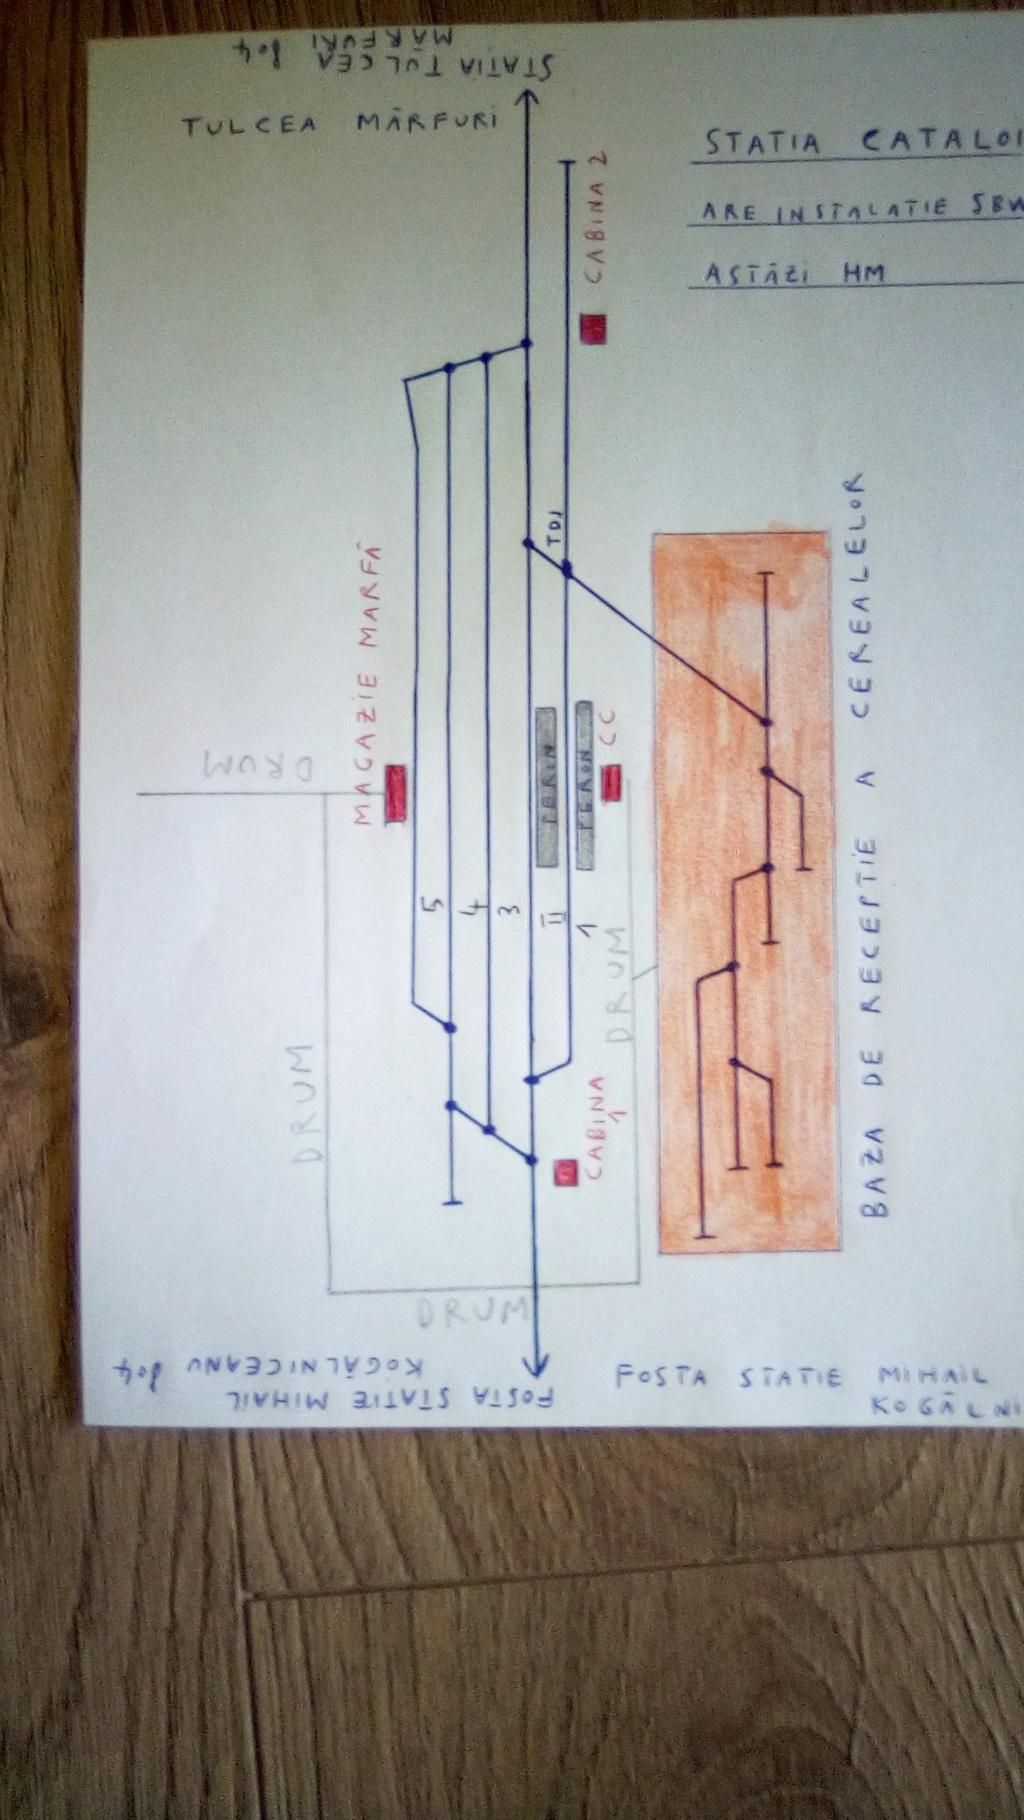 804 : Medgidia - Tulcea Oras - Pagina 35 Hm_fos12